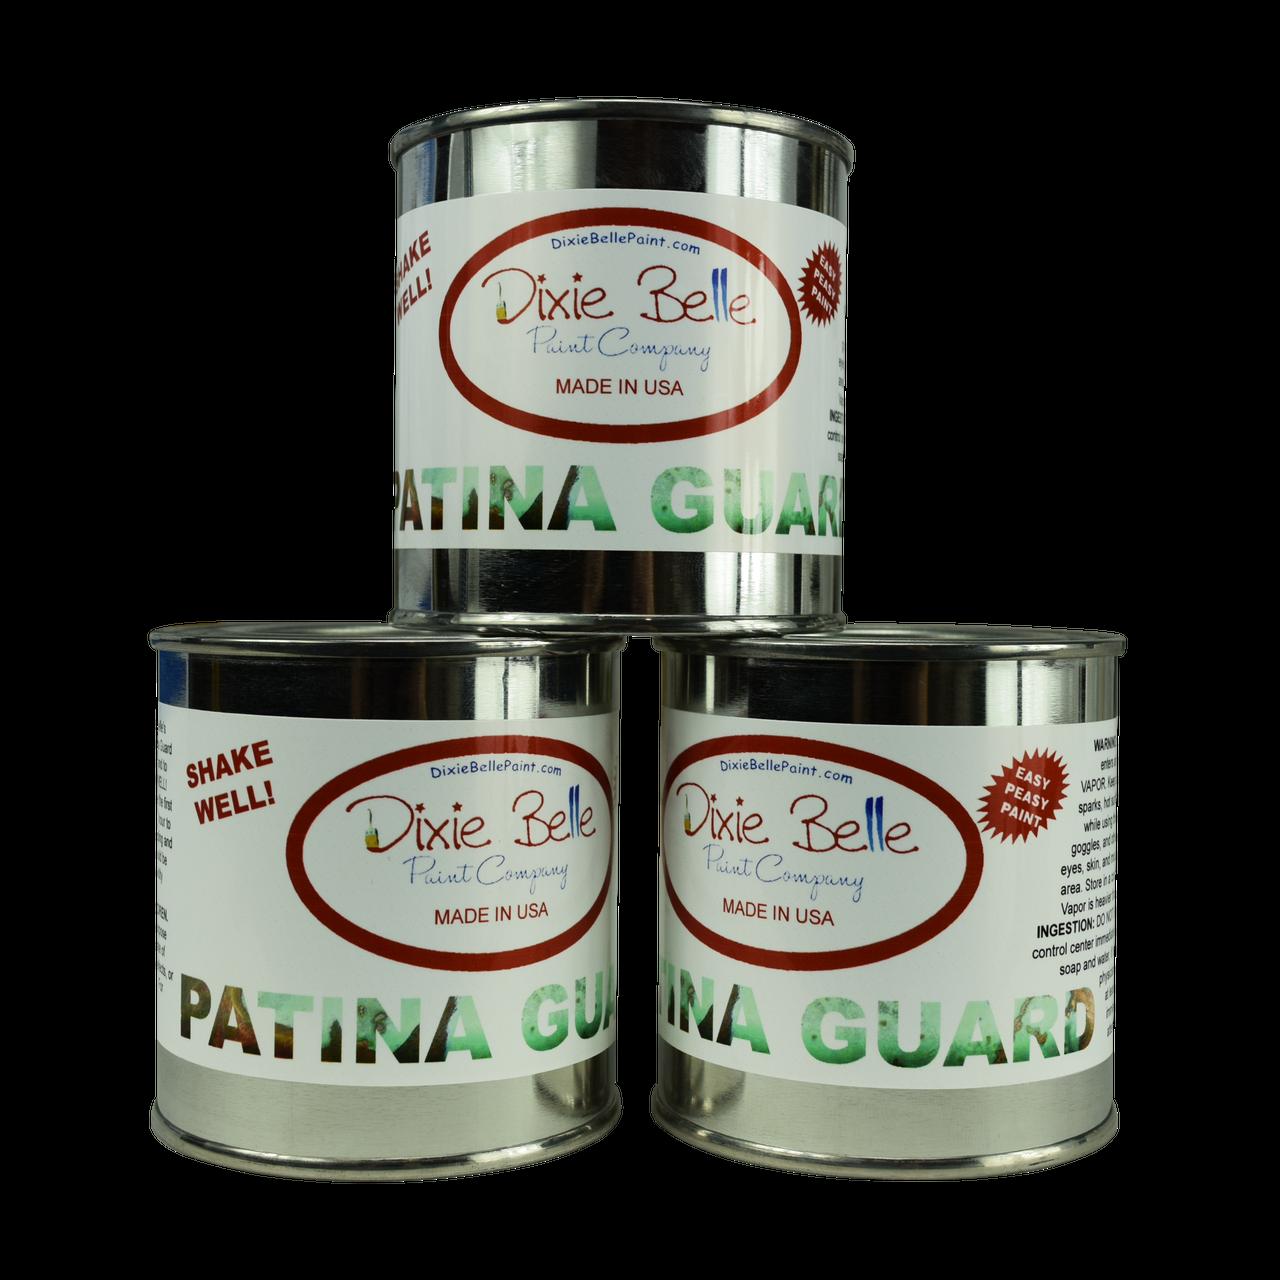 Dixie Belle Patina Guard